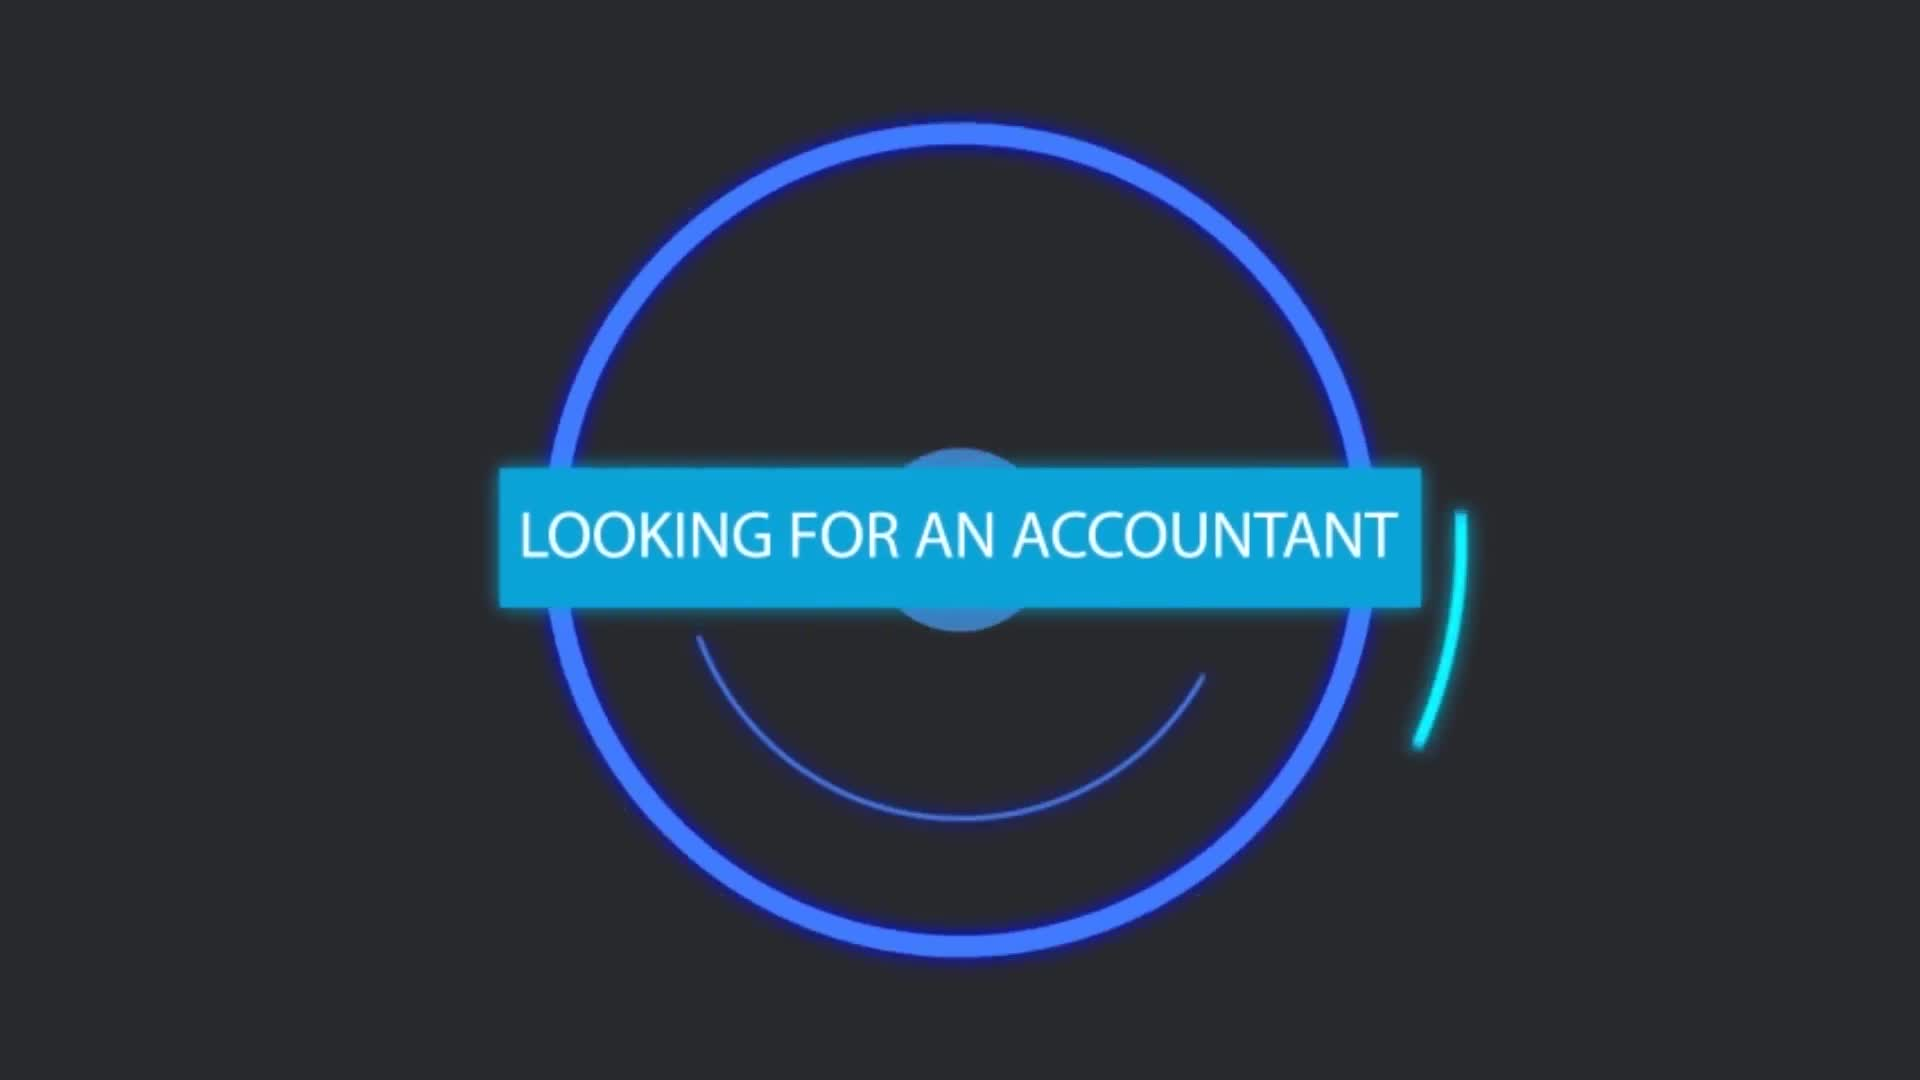 Michele Winger CMA Public Accountant - Accountants - 403-529-9005